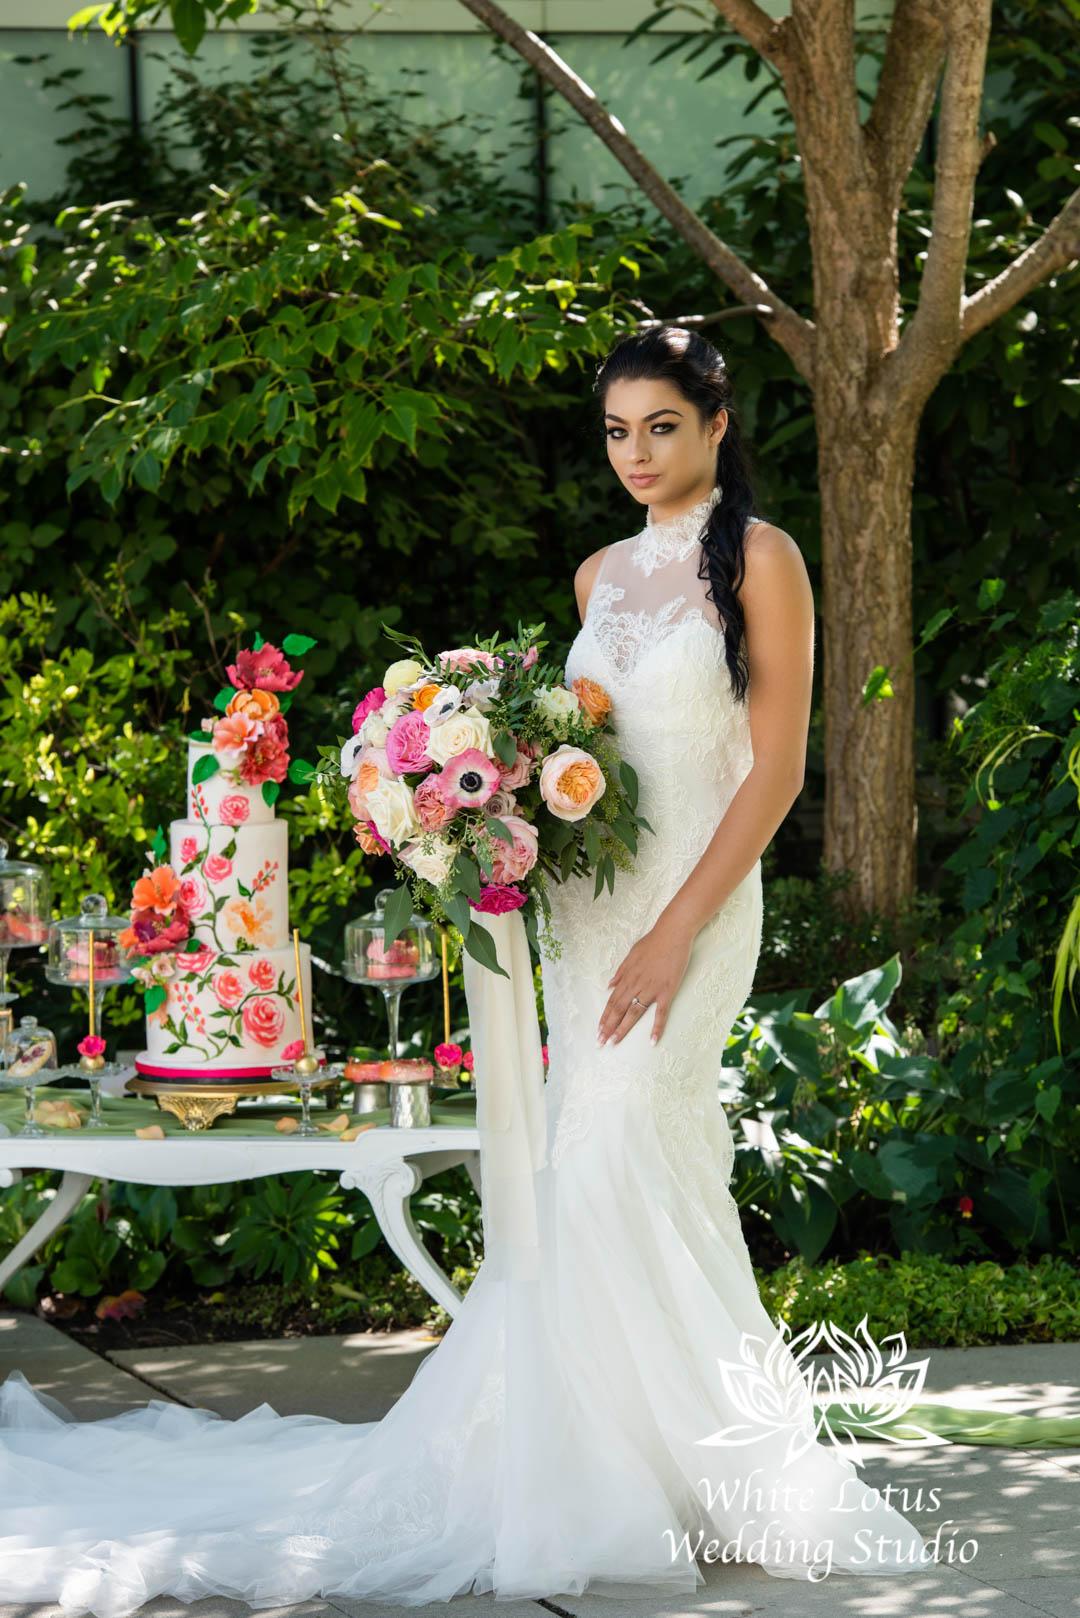 079- SPRING GARDEN WEDDING INSPIRATION